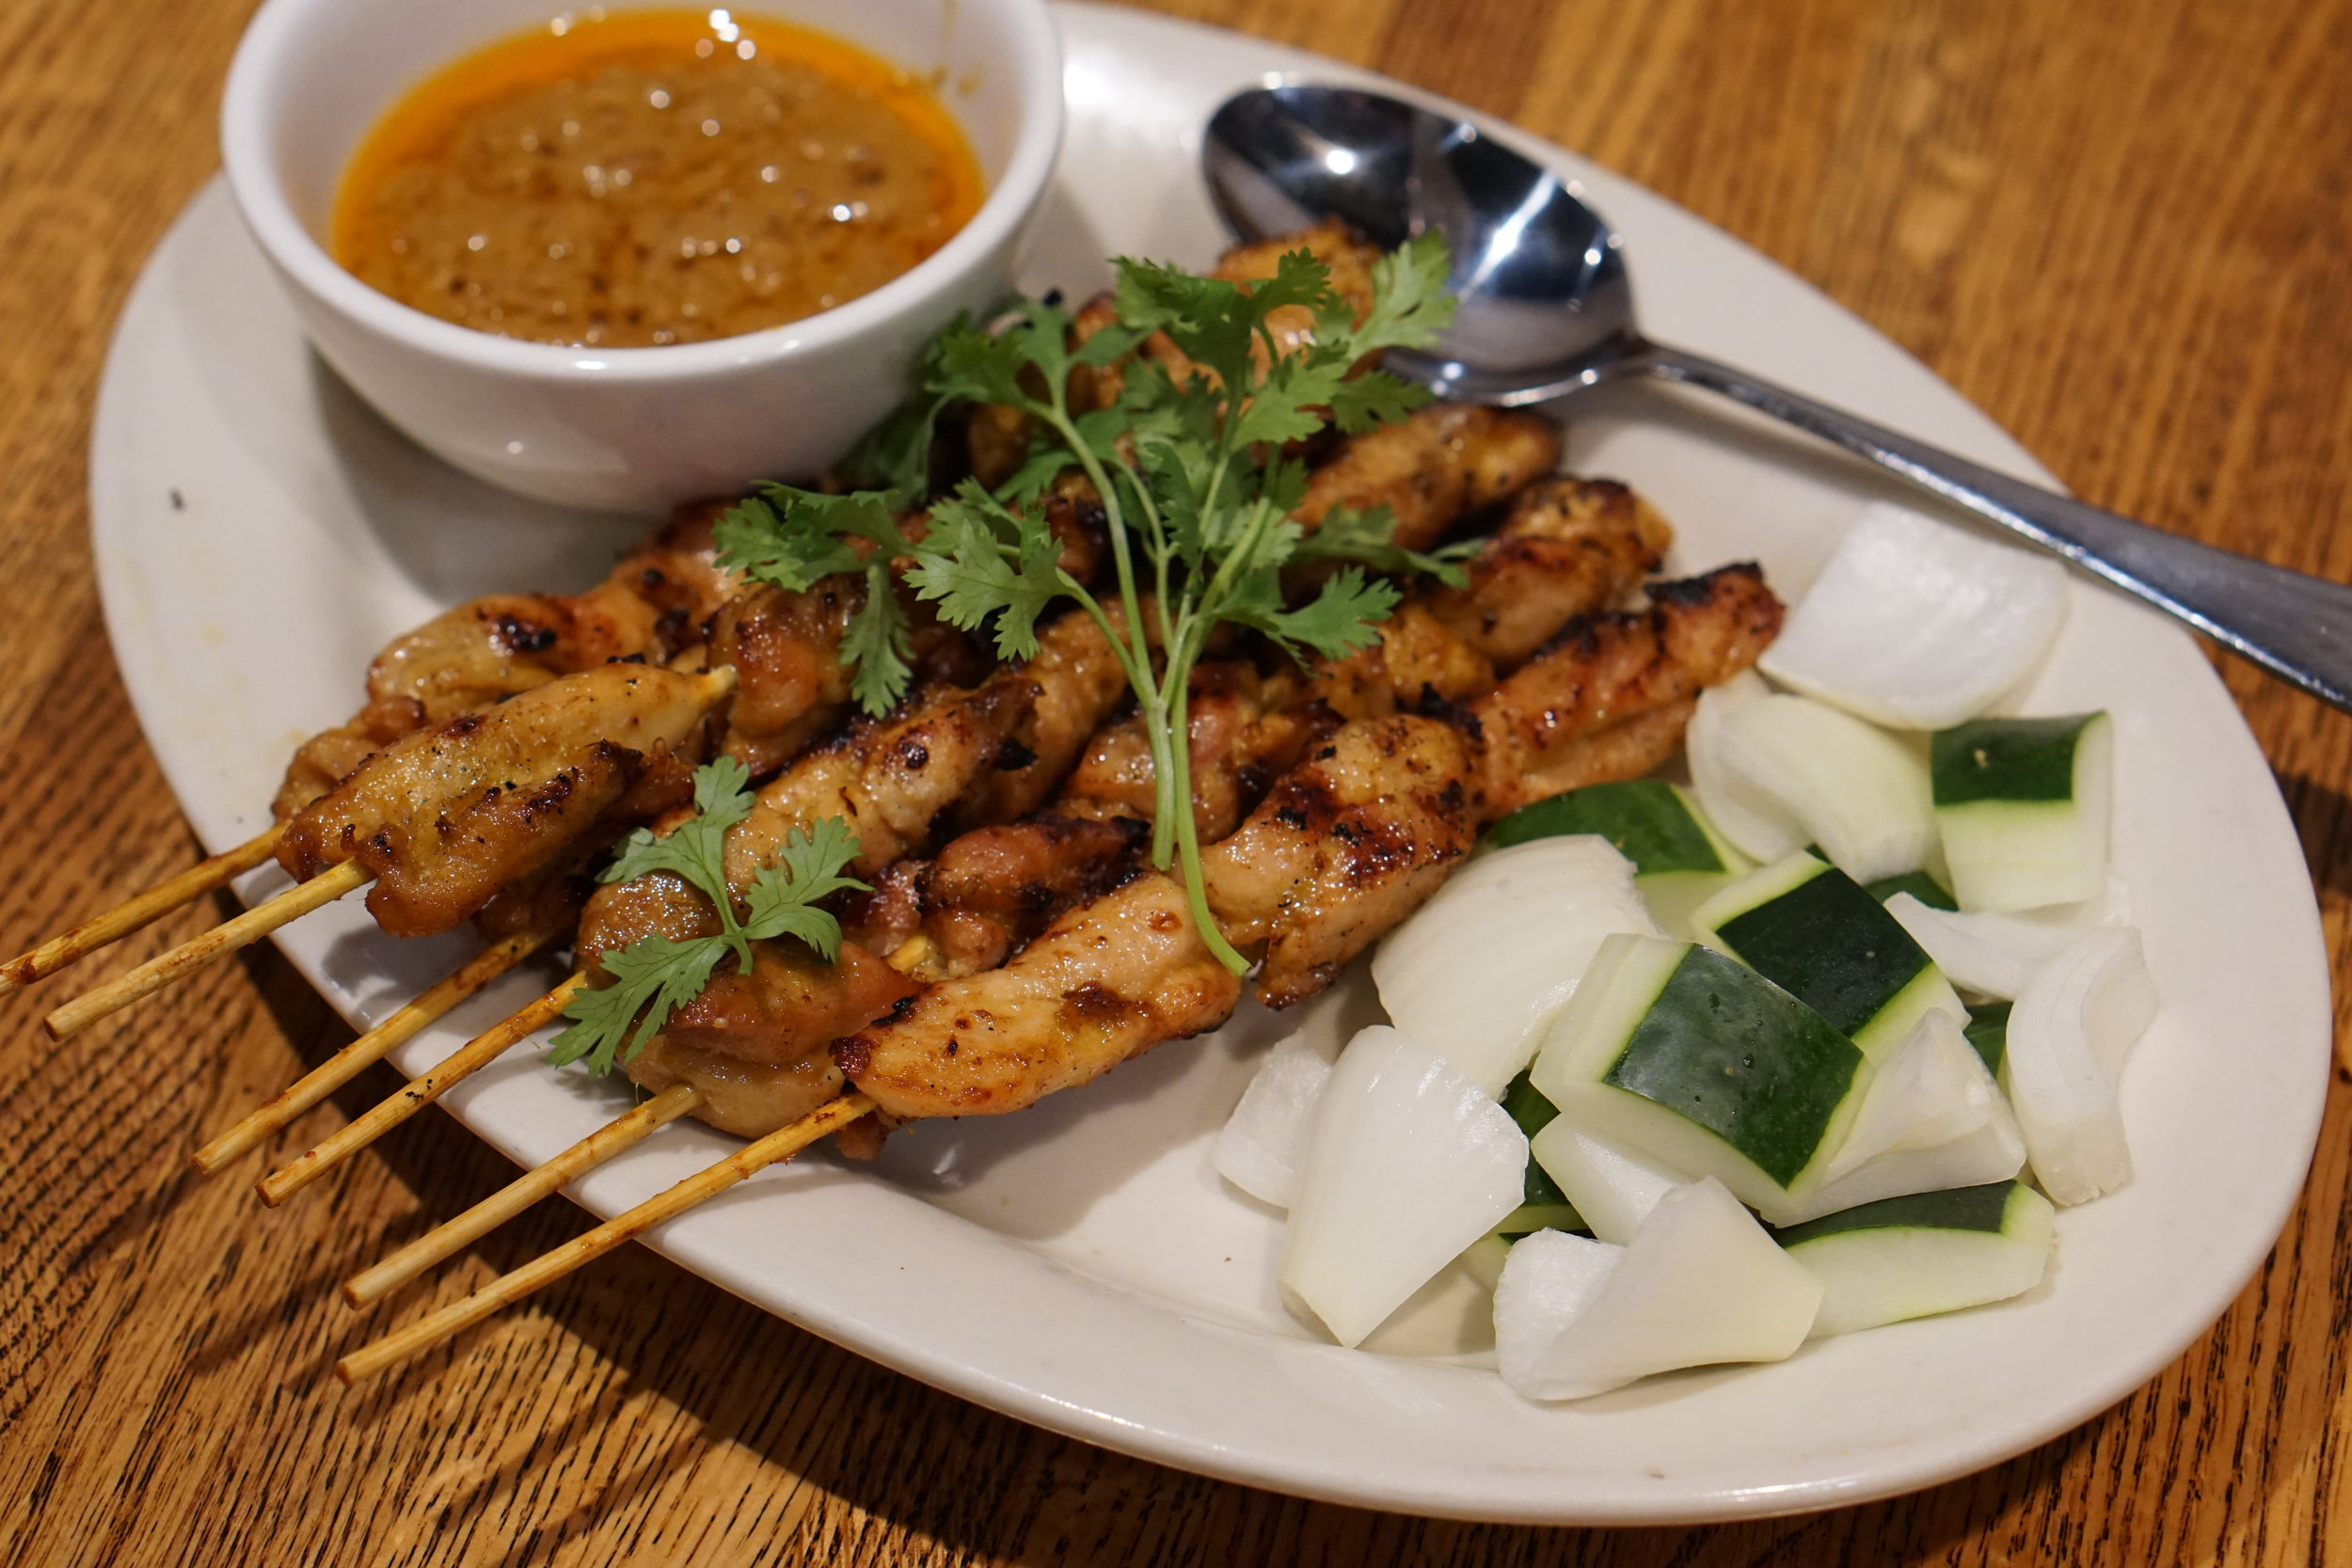 Ardmore Restaurant Week Returns To 18 Restaurants July 17 To